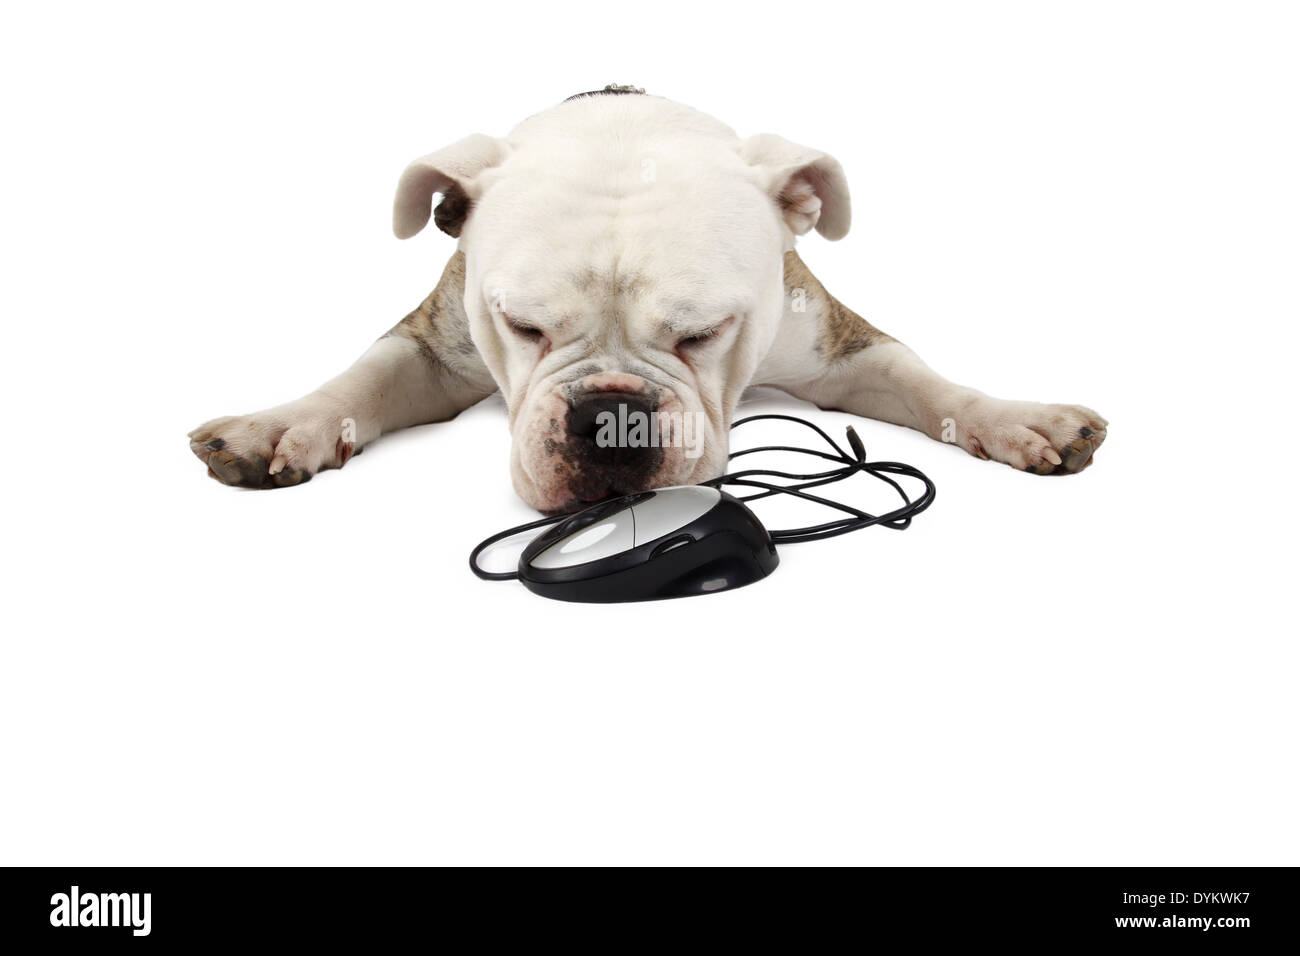 Englische Bulldogge, Canis lupus f. familiaris, English bulldog - Stock Image